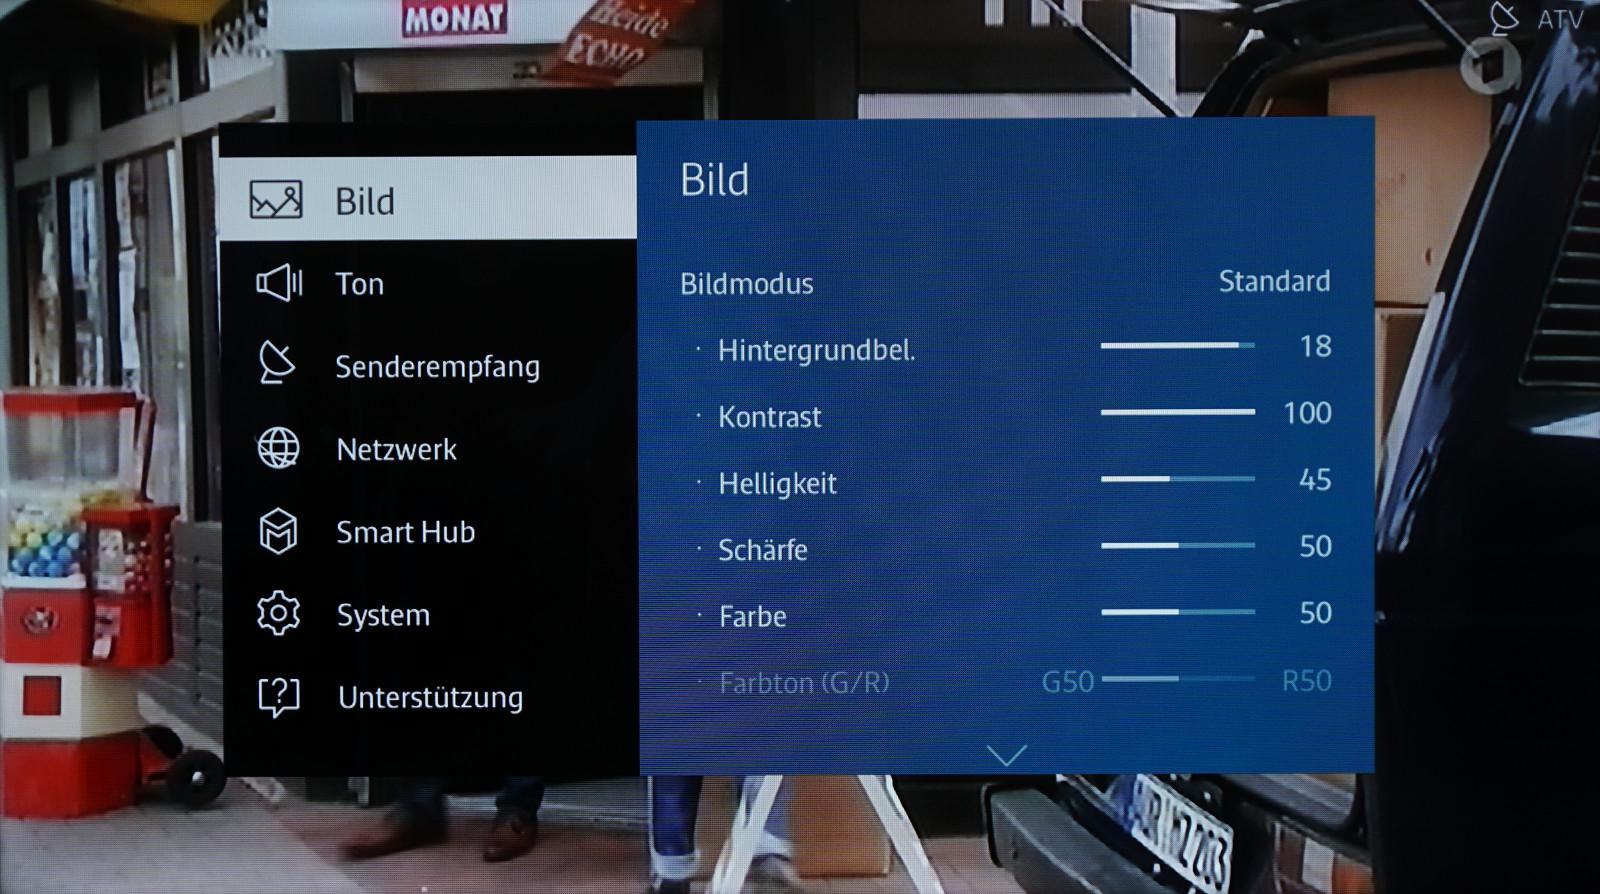 samsungs smart tv betriebssystem tizen im test. Black Bedroom Furniture Sets. Home Design Ideas